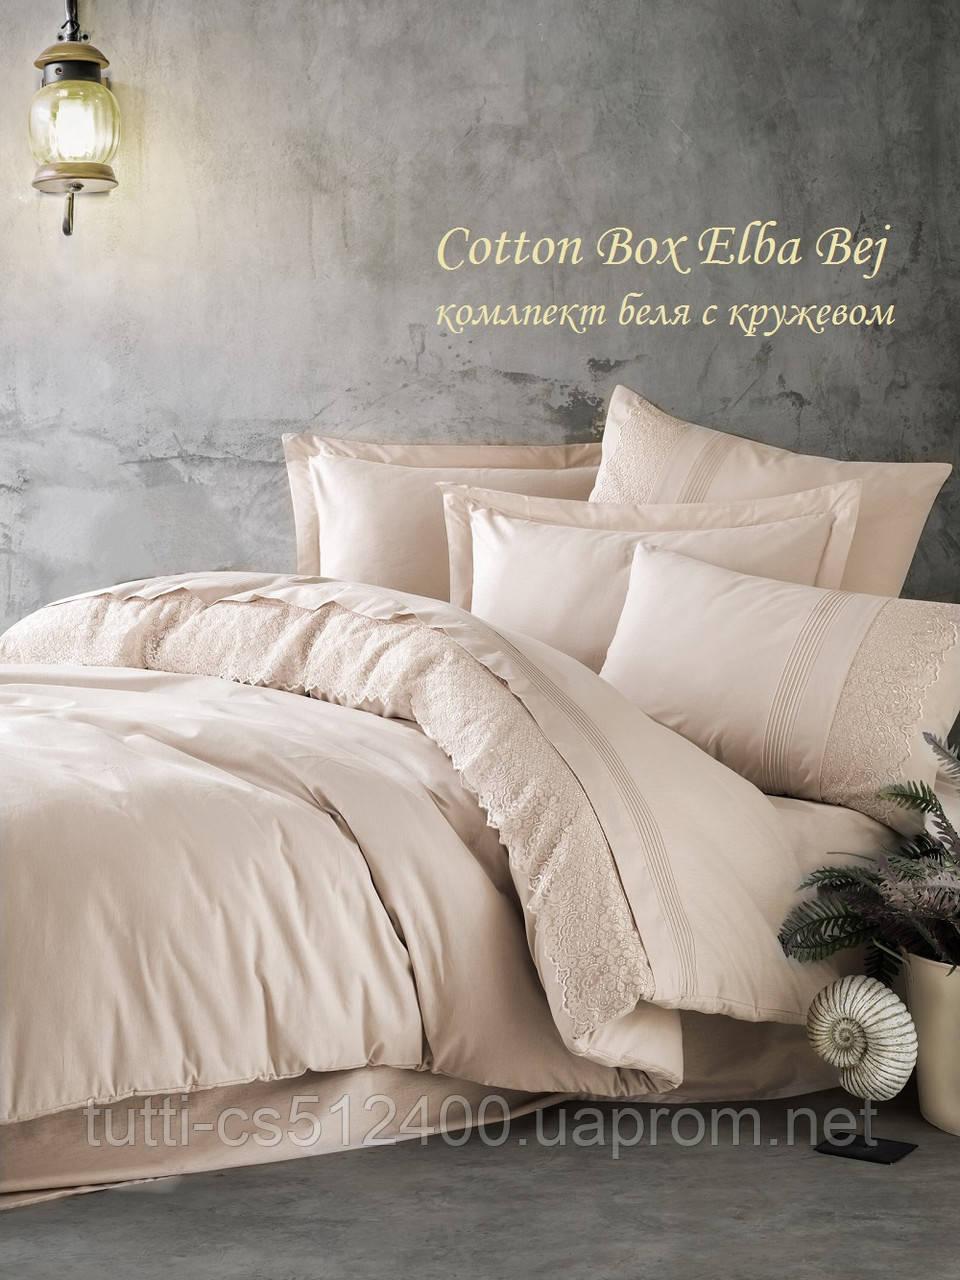 Cotton Box Elba  комлпект беля с кружевом